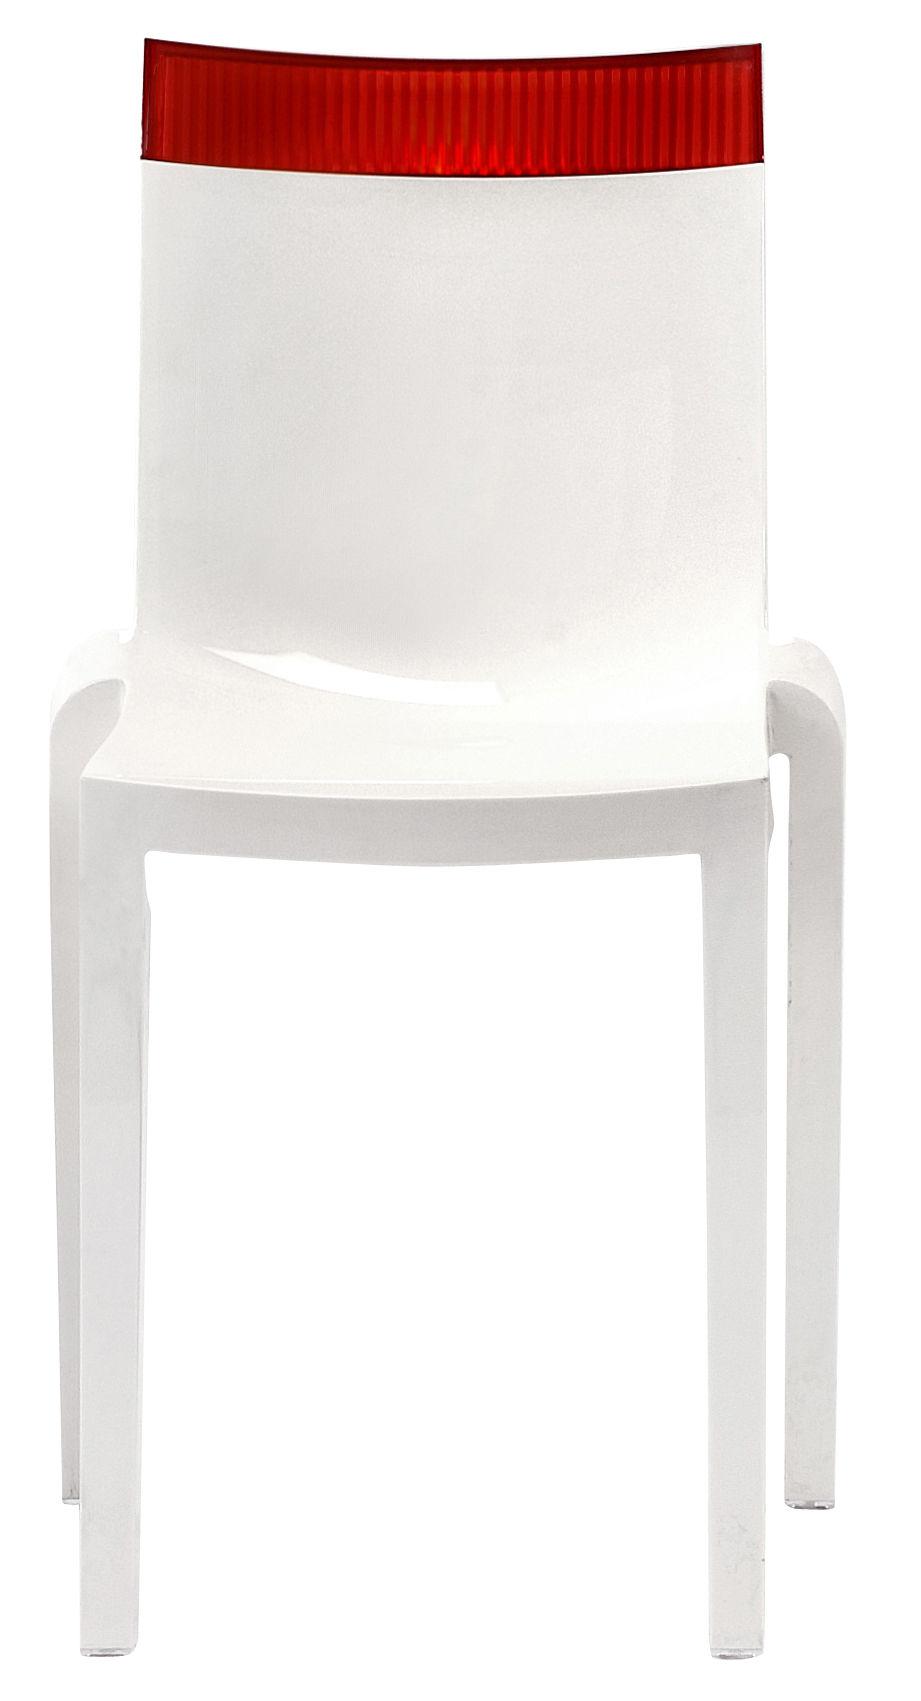 Möbel - Stühle  - Hi Cut Stapelbarer Stuhl Gestell weiß lackiert - Kartell - Weiß lackiert / Rot - Polykarbonat